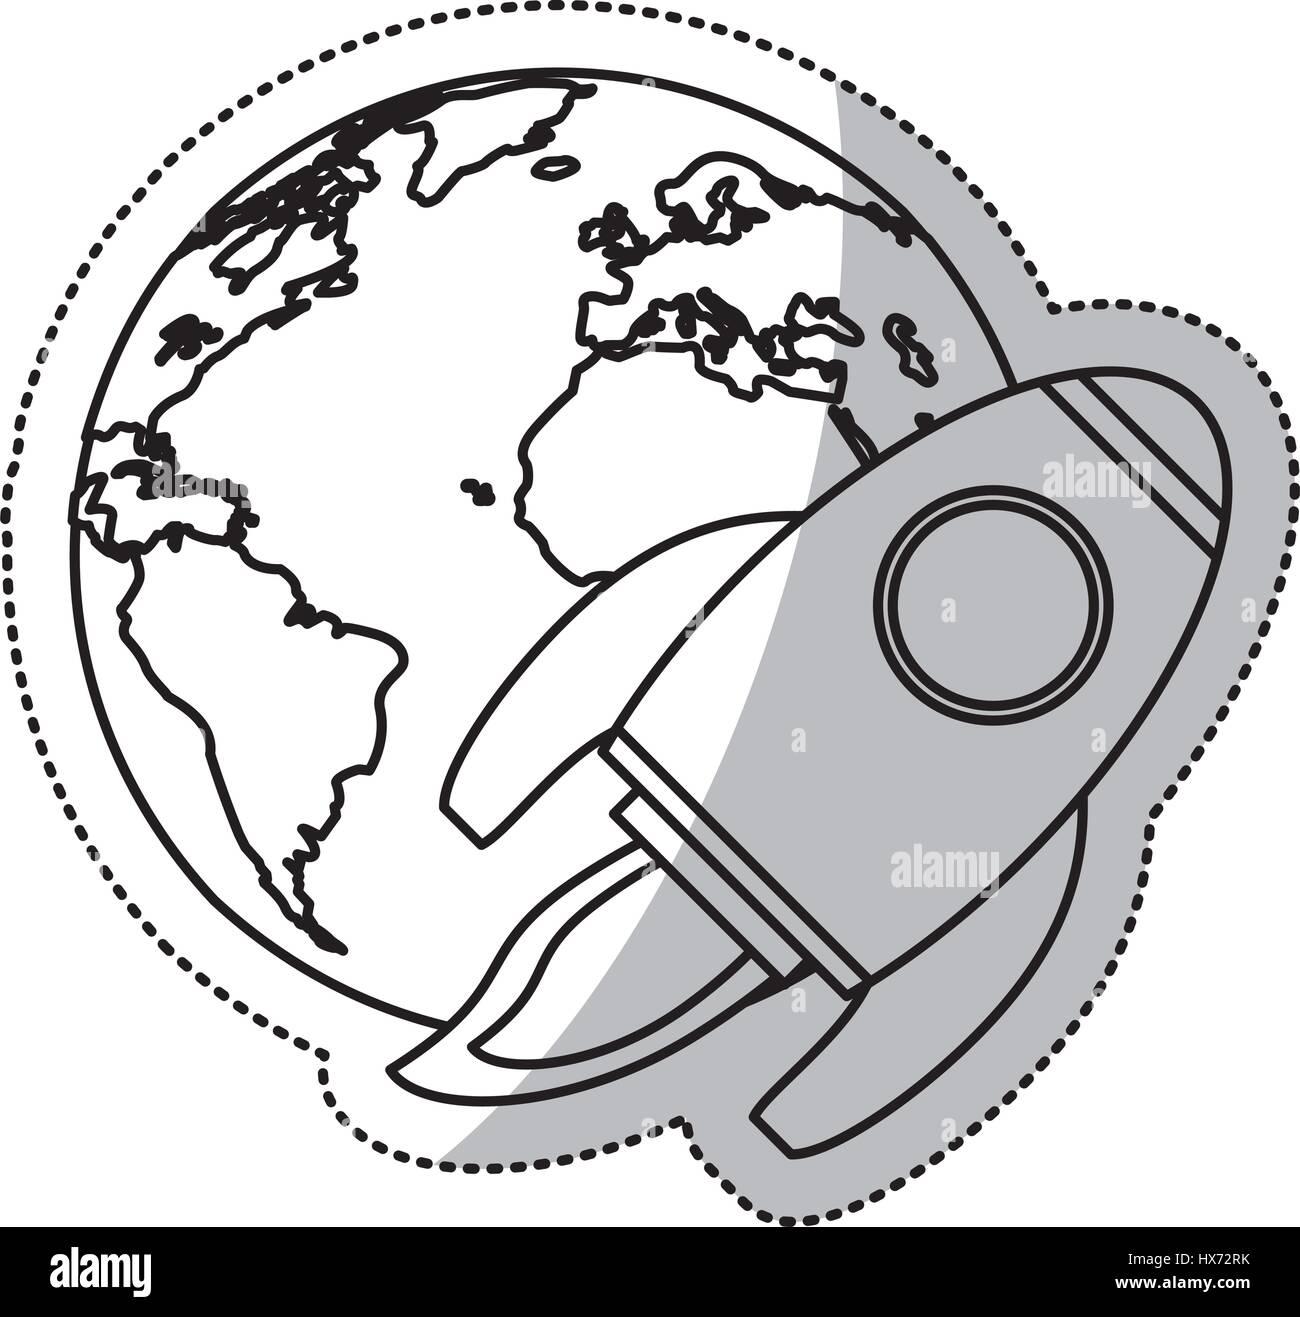 earth world rocket flying space outline stock vector art